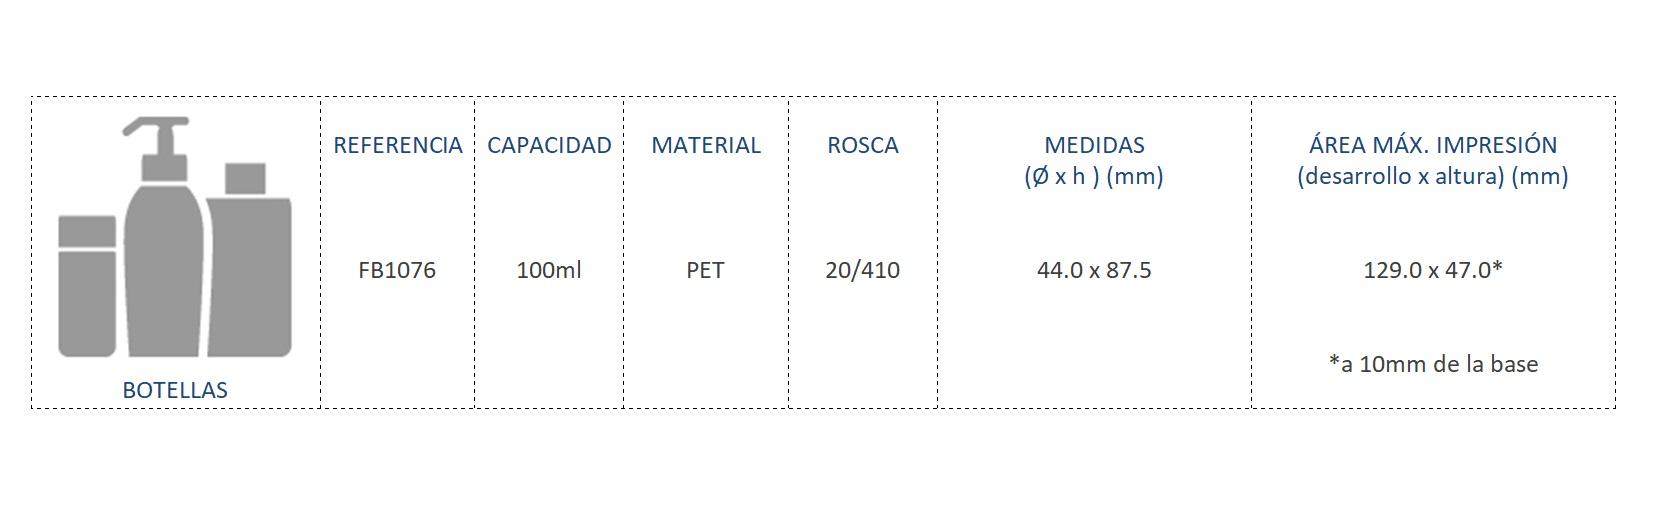 Cuadro de materiales FB1076